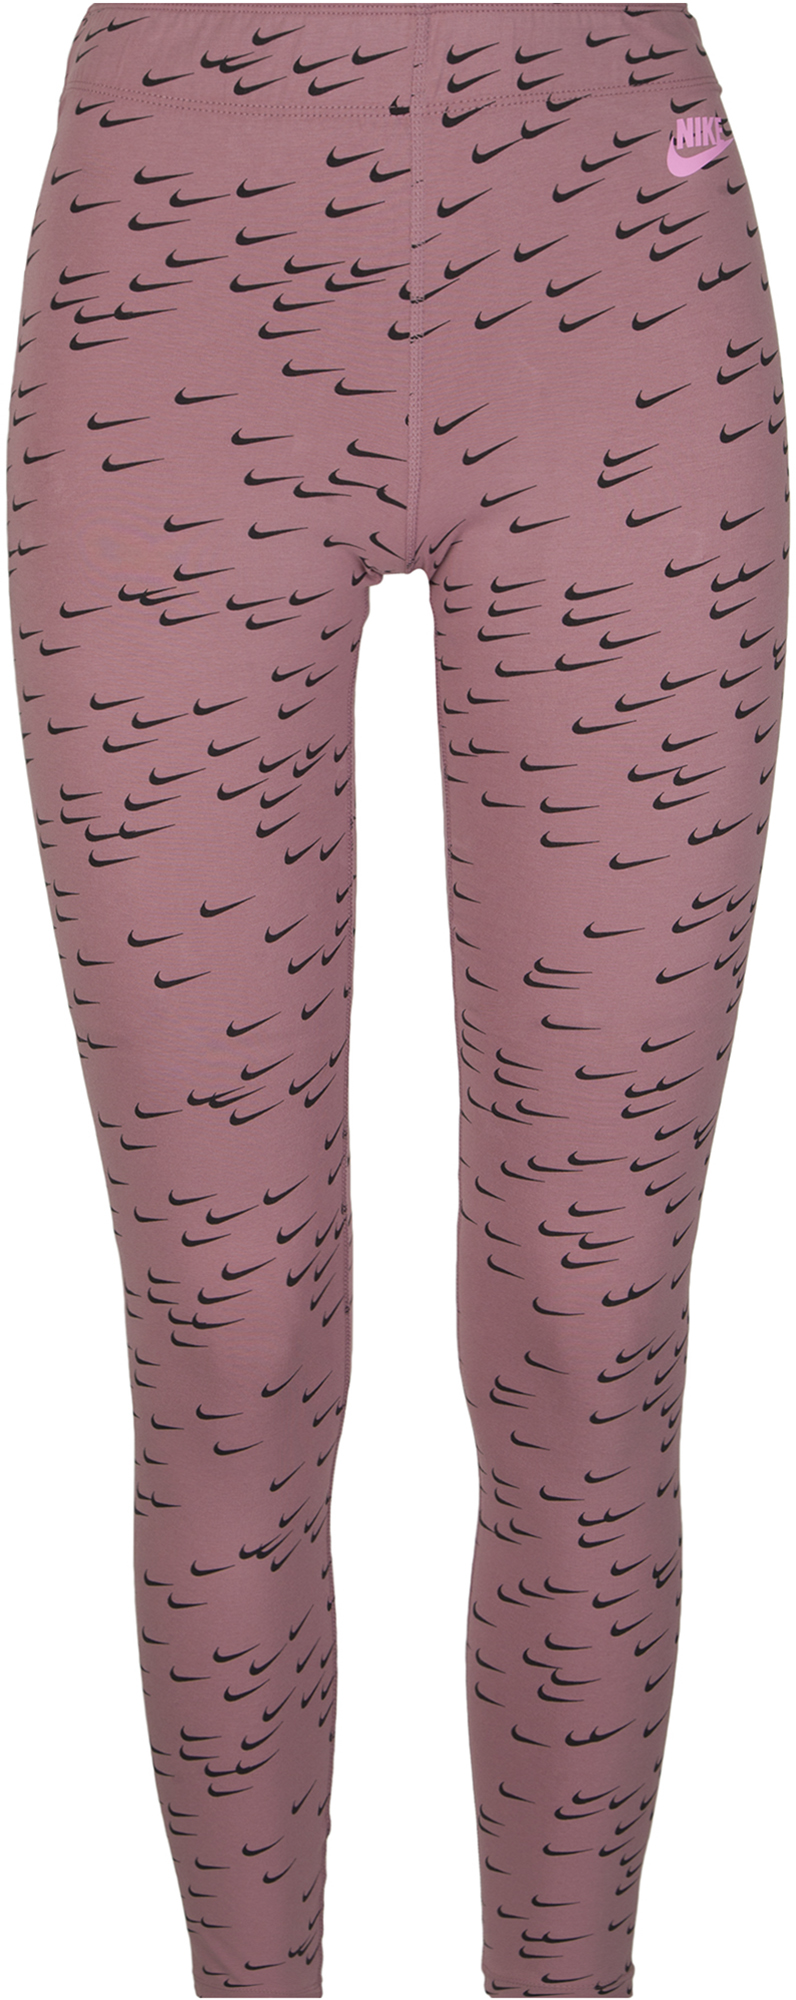 цена на Nike Легинсы женские Nike Sportswear Leg-A-See, размер 46-48